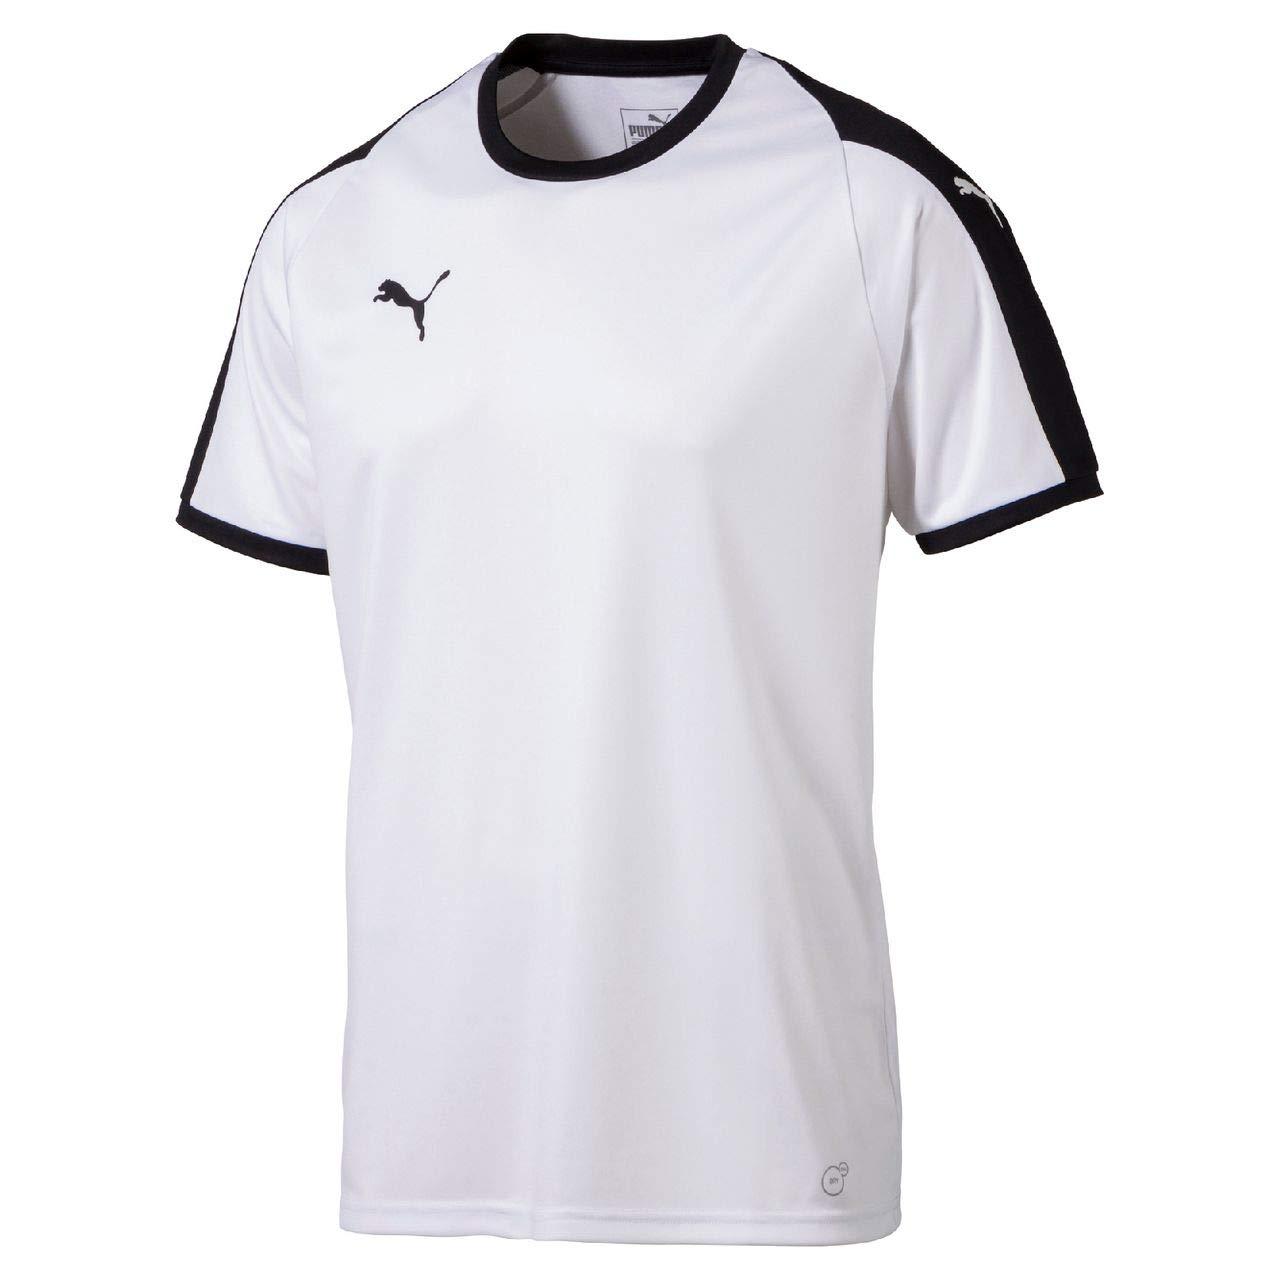 Puma Liga Jersey Camiseta, Hombre, White/Black, M product image